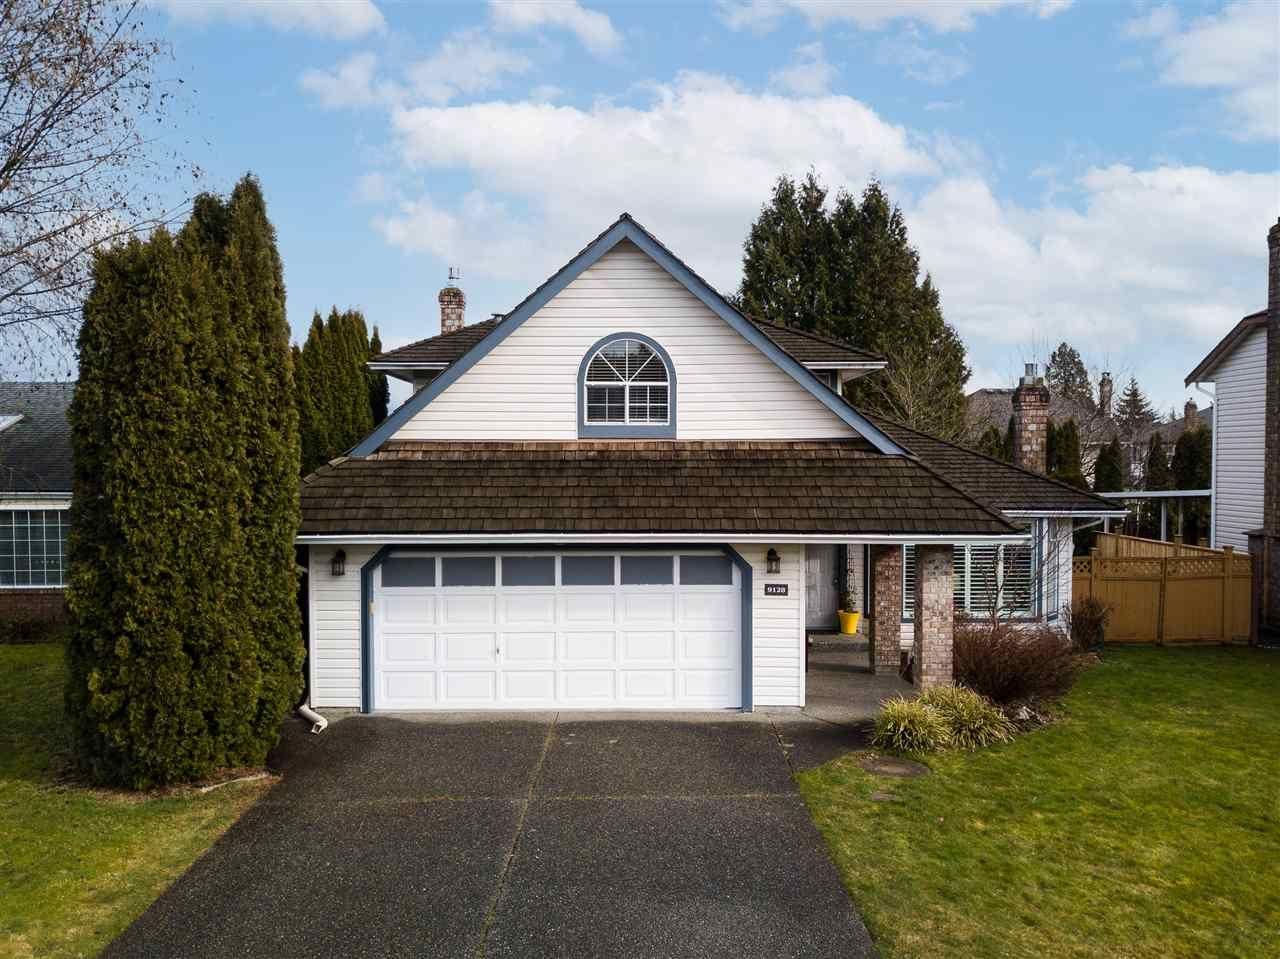 Main Photo: 9128 160A Street in Surrey: Fleetwood Tynehead House for sale : MLS®# R2541796